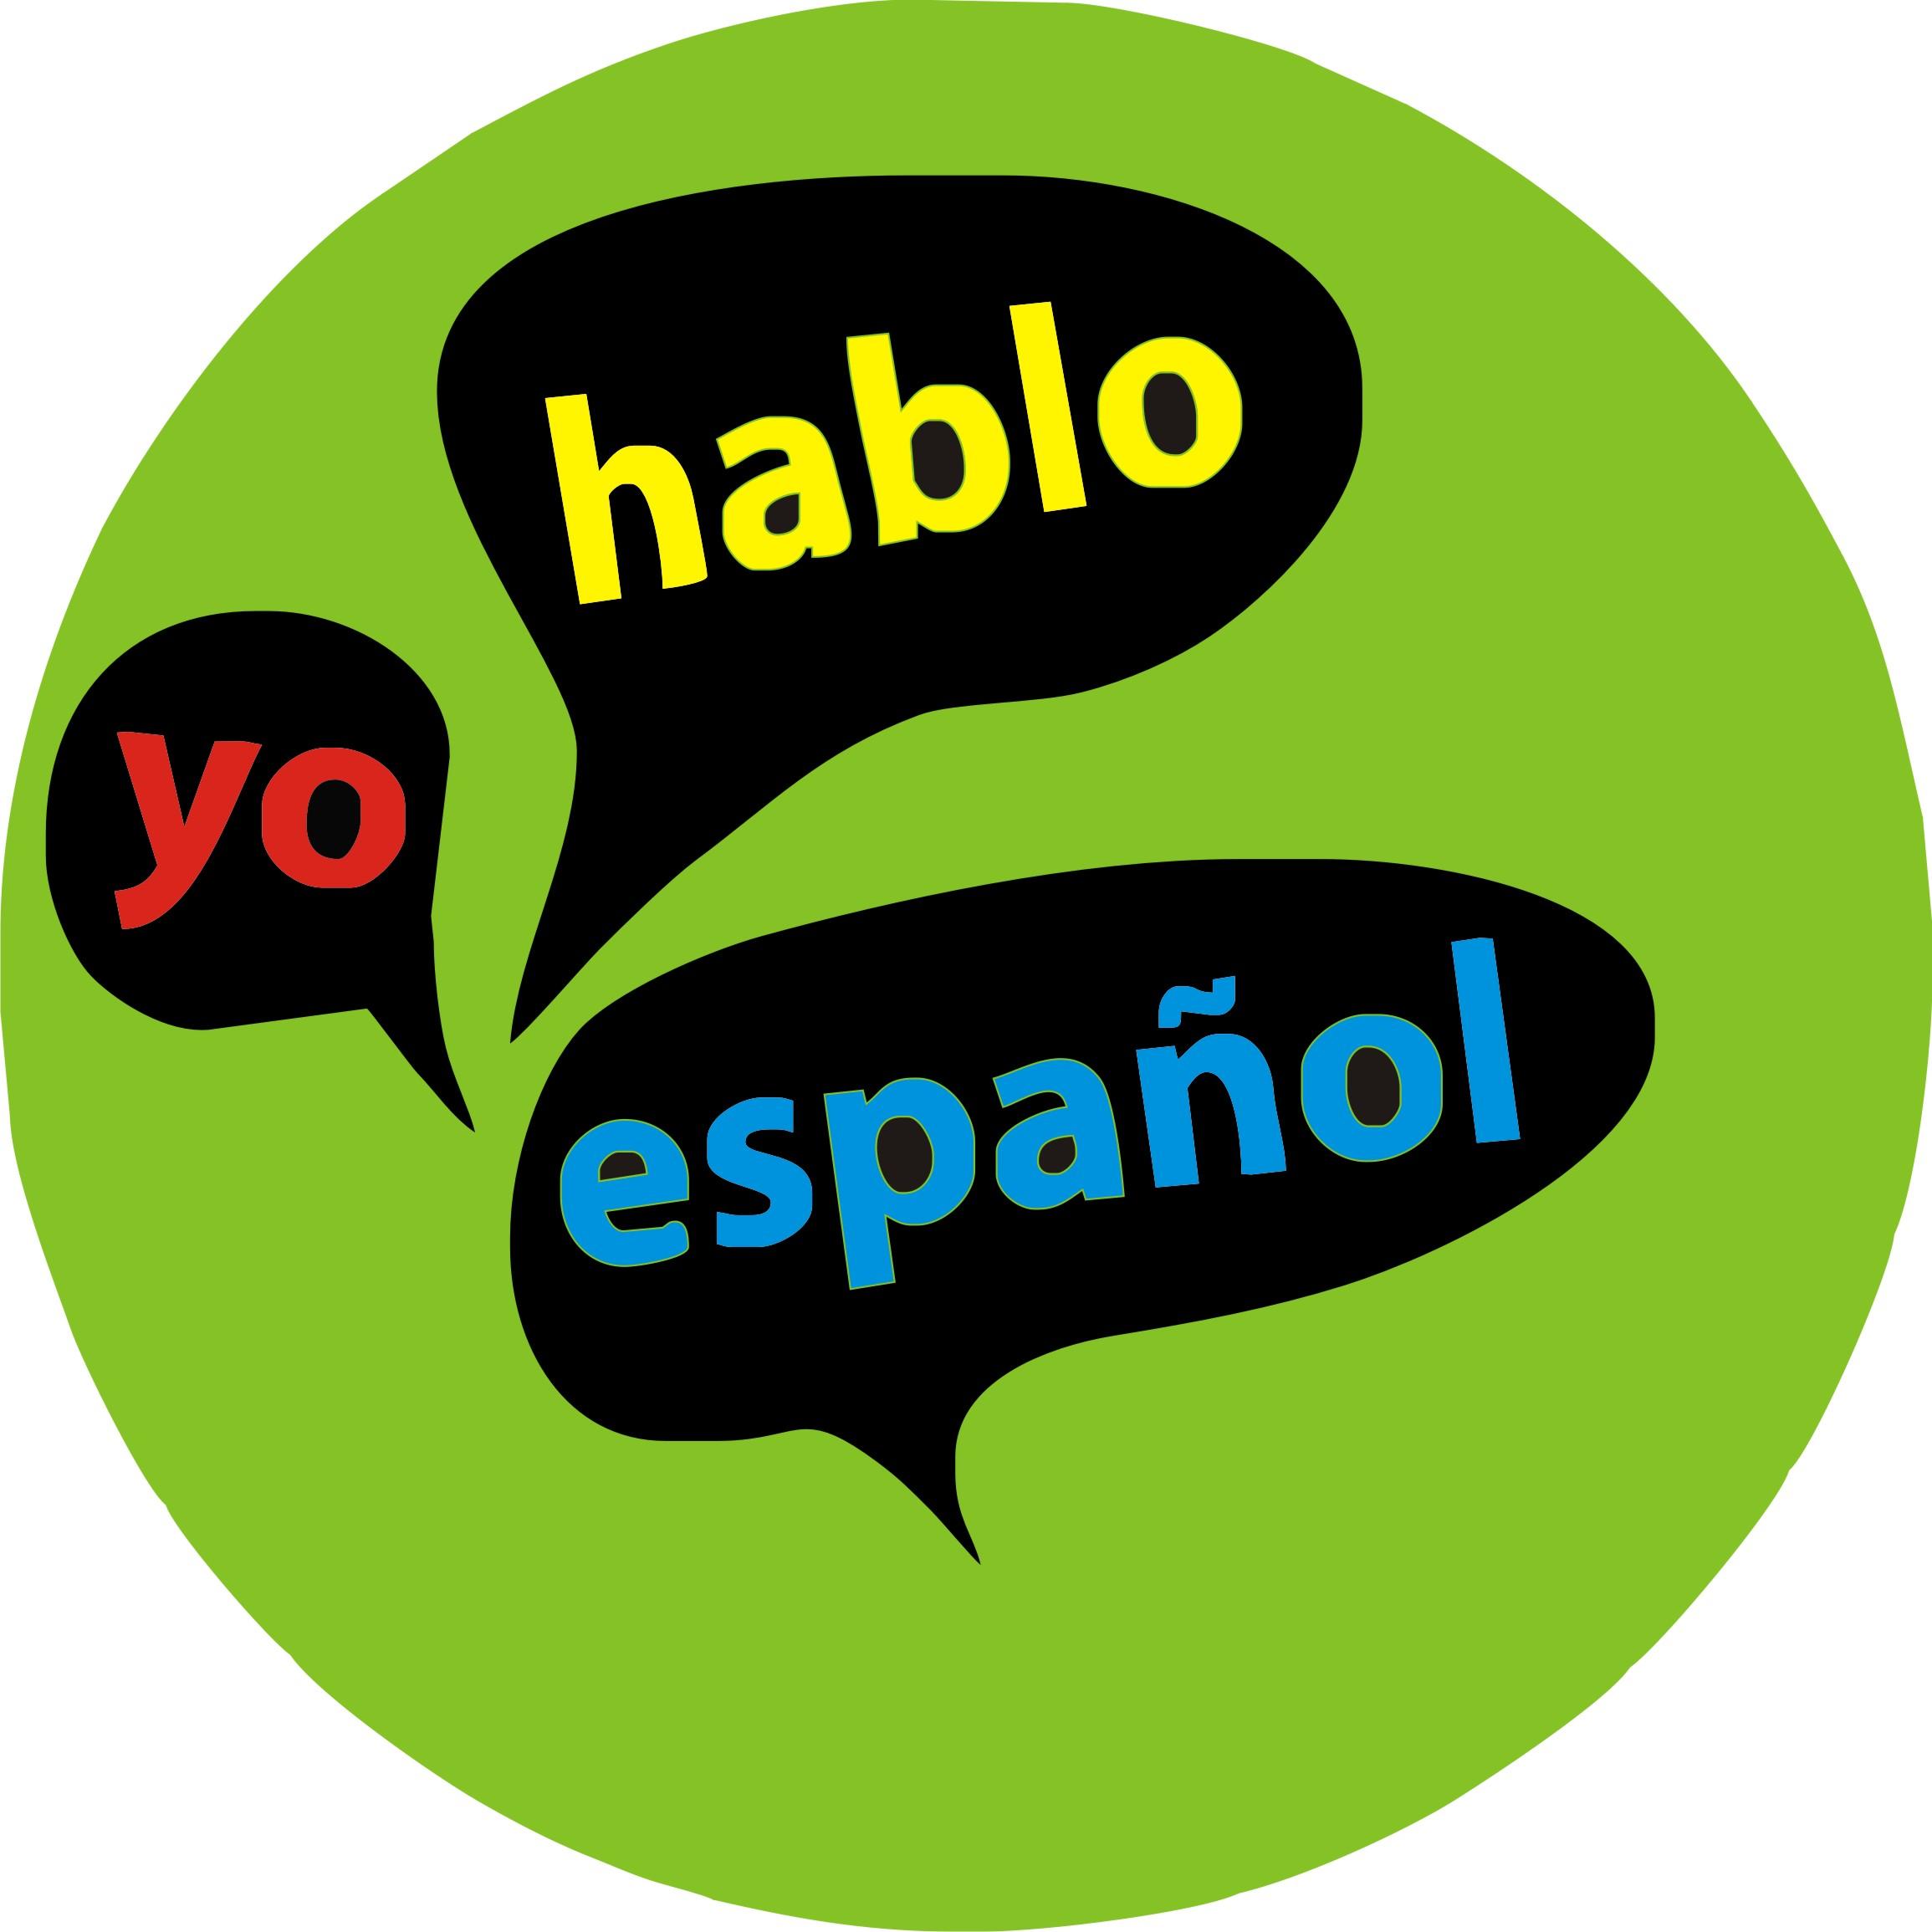 Spanish Language Clip Art free image.